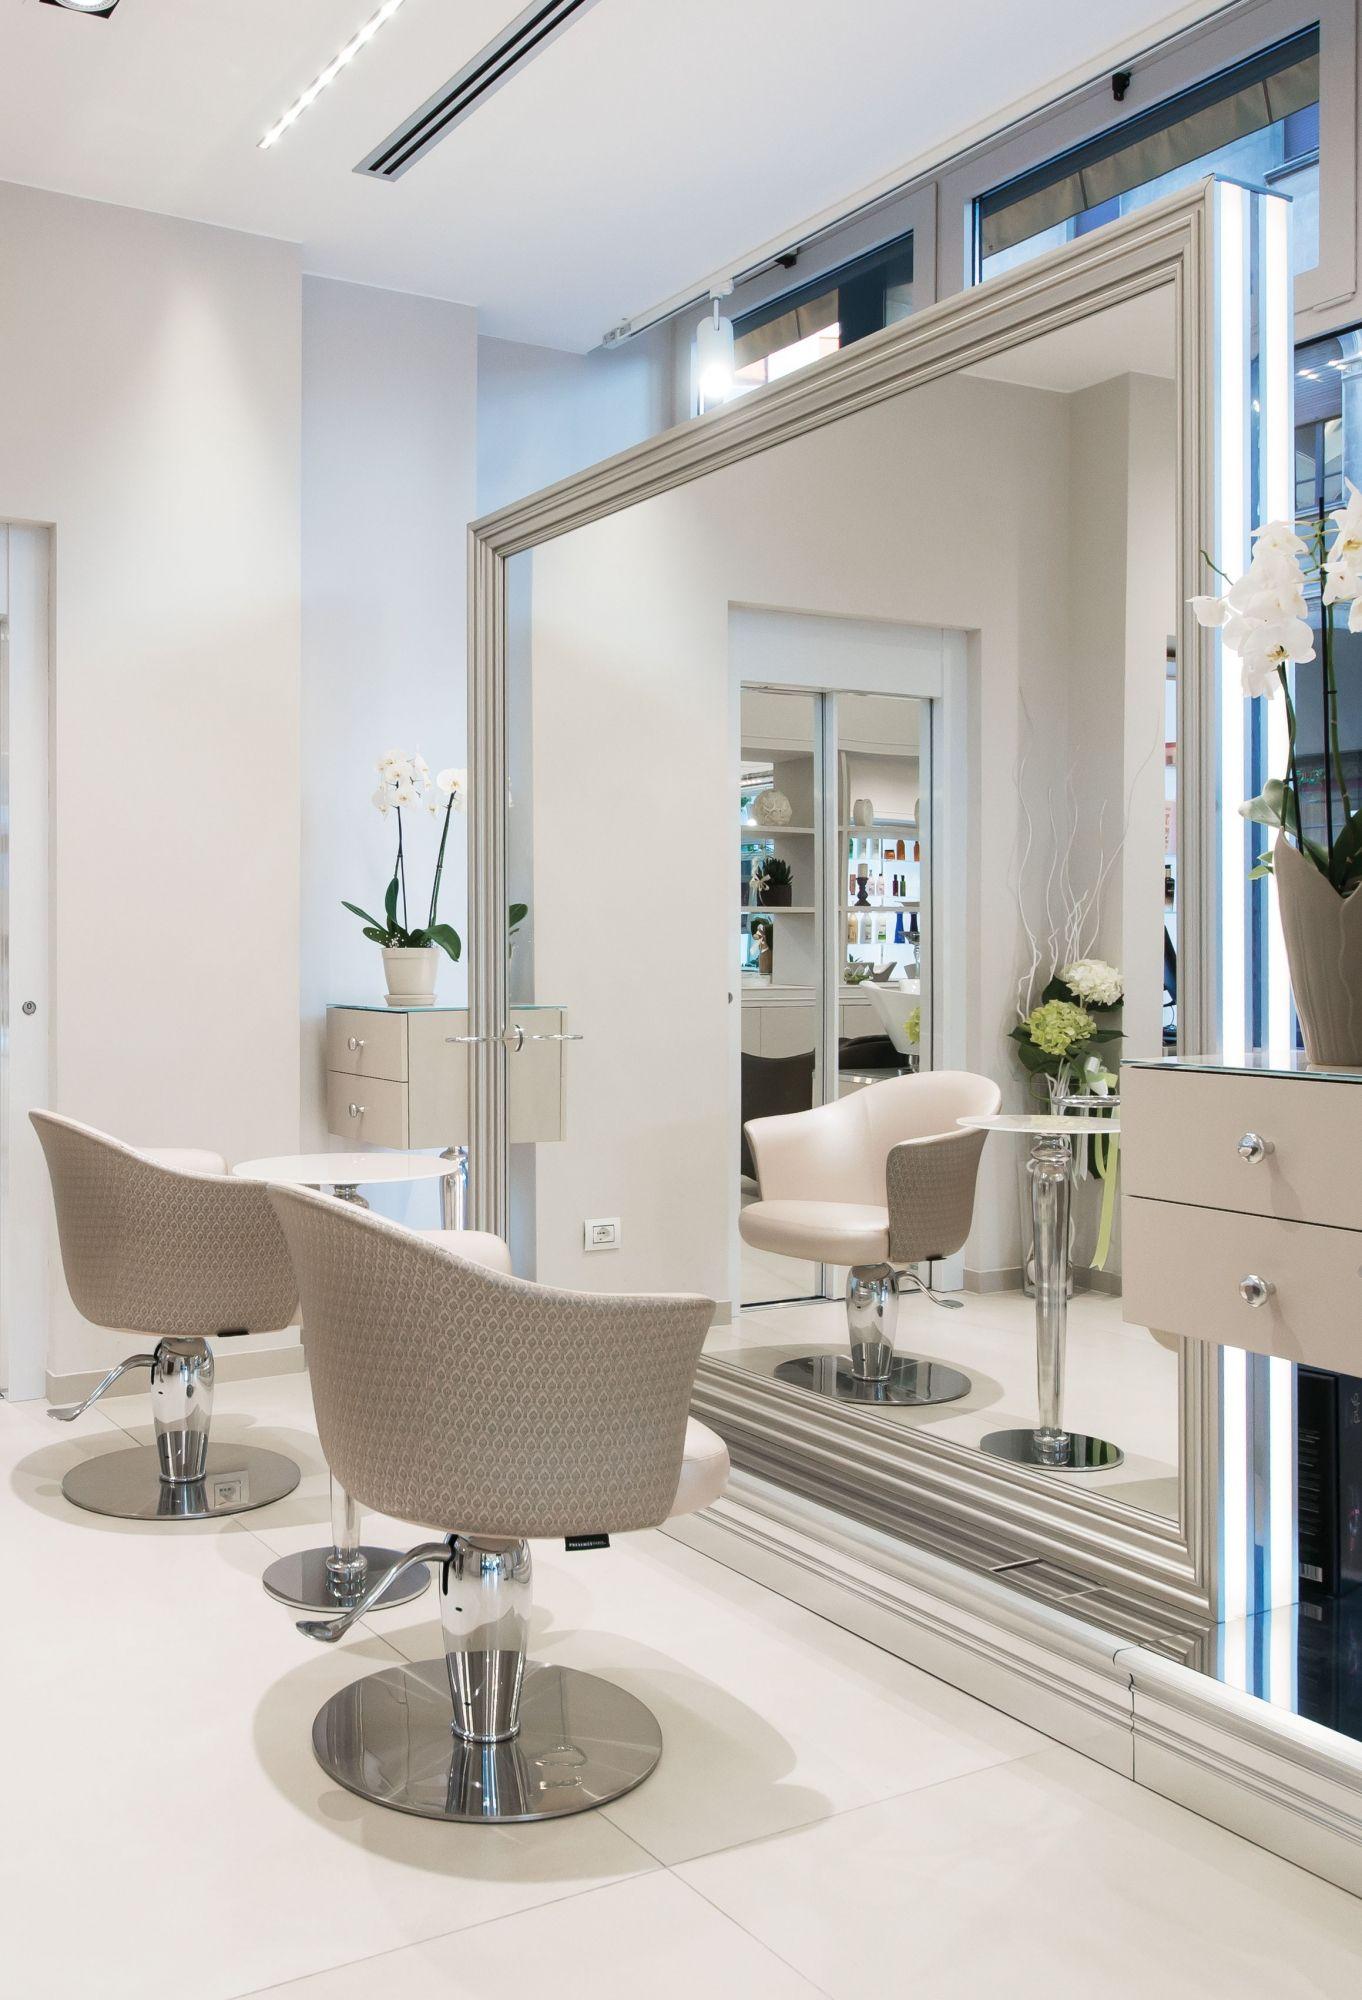 Rodolfo Double Freestanding Styling Unit Beauty Salon Furniture Salon Interior Salon Furniture